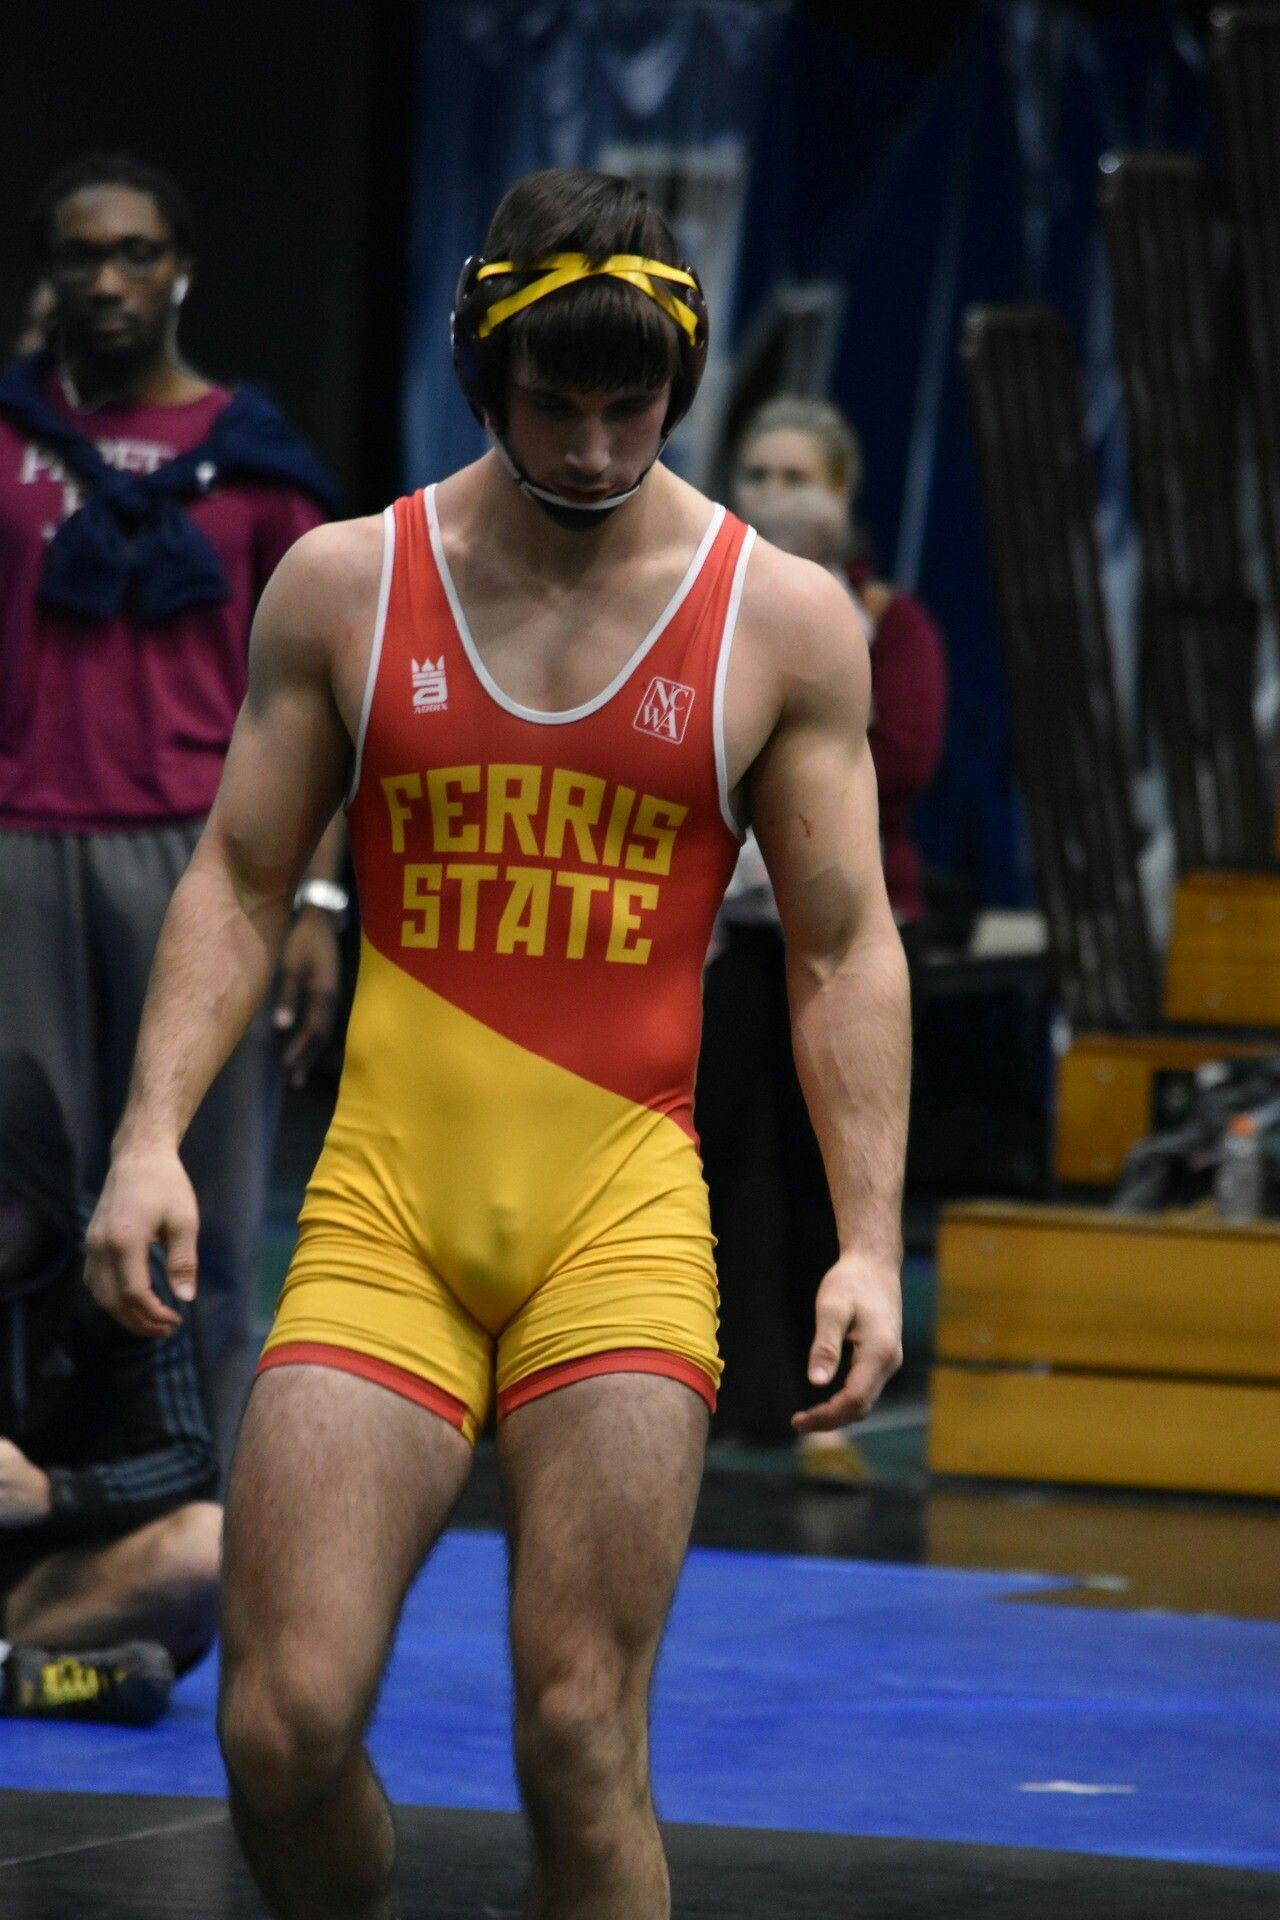 Pin by jehean on wrestling | Wrestling singlet, Combat clothes, Lycra men